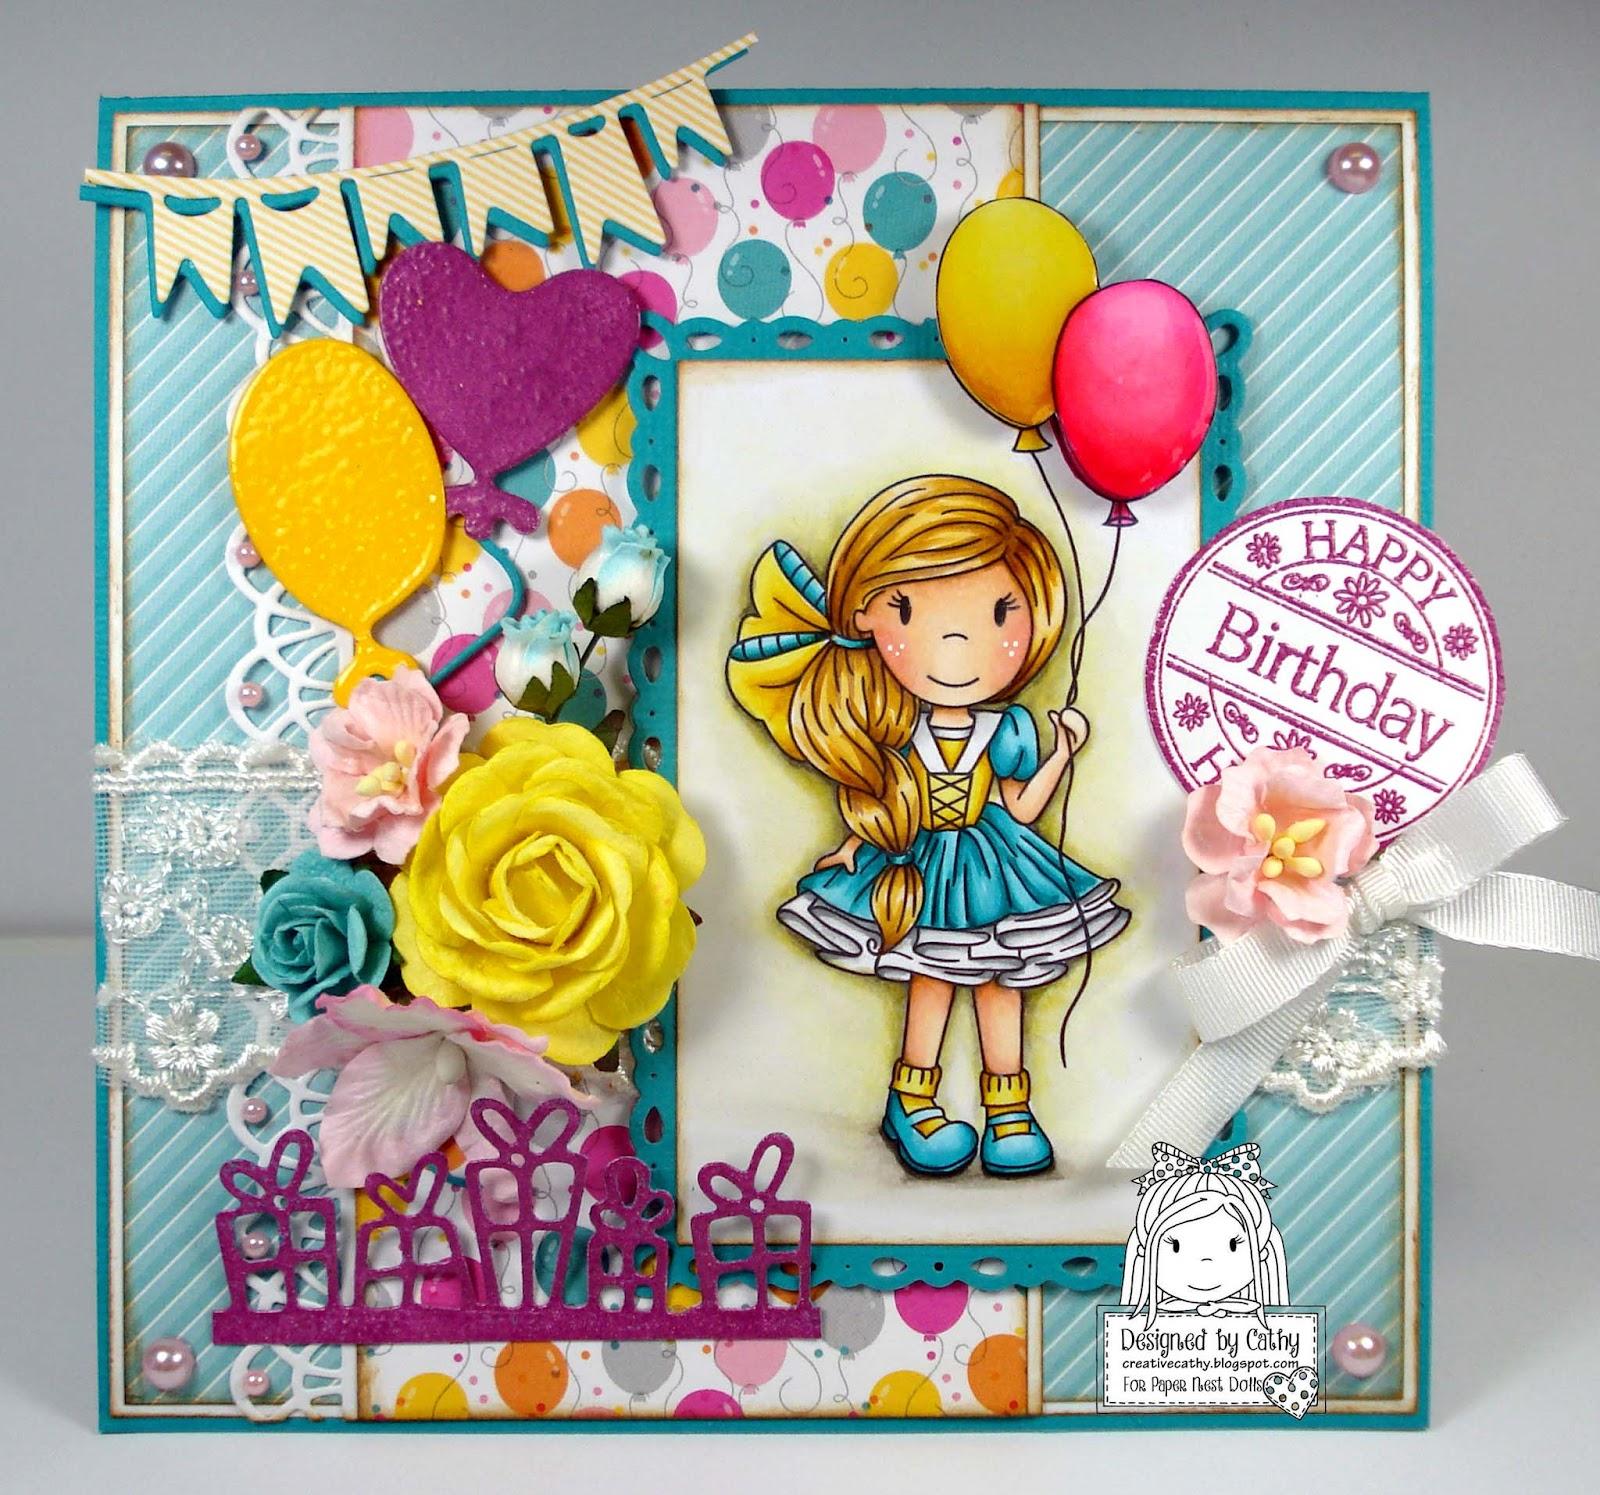 Cathy's Creative Place: Happy Birthday, Allie